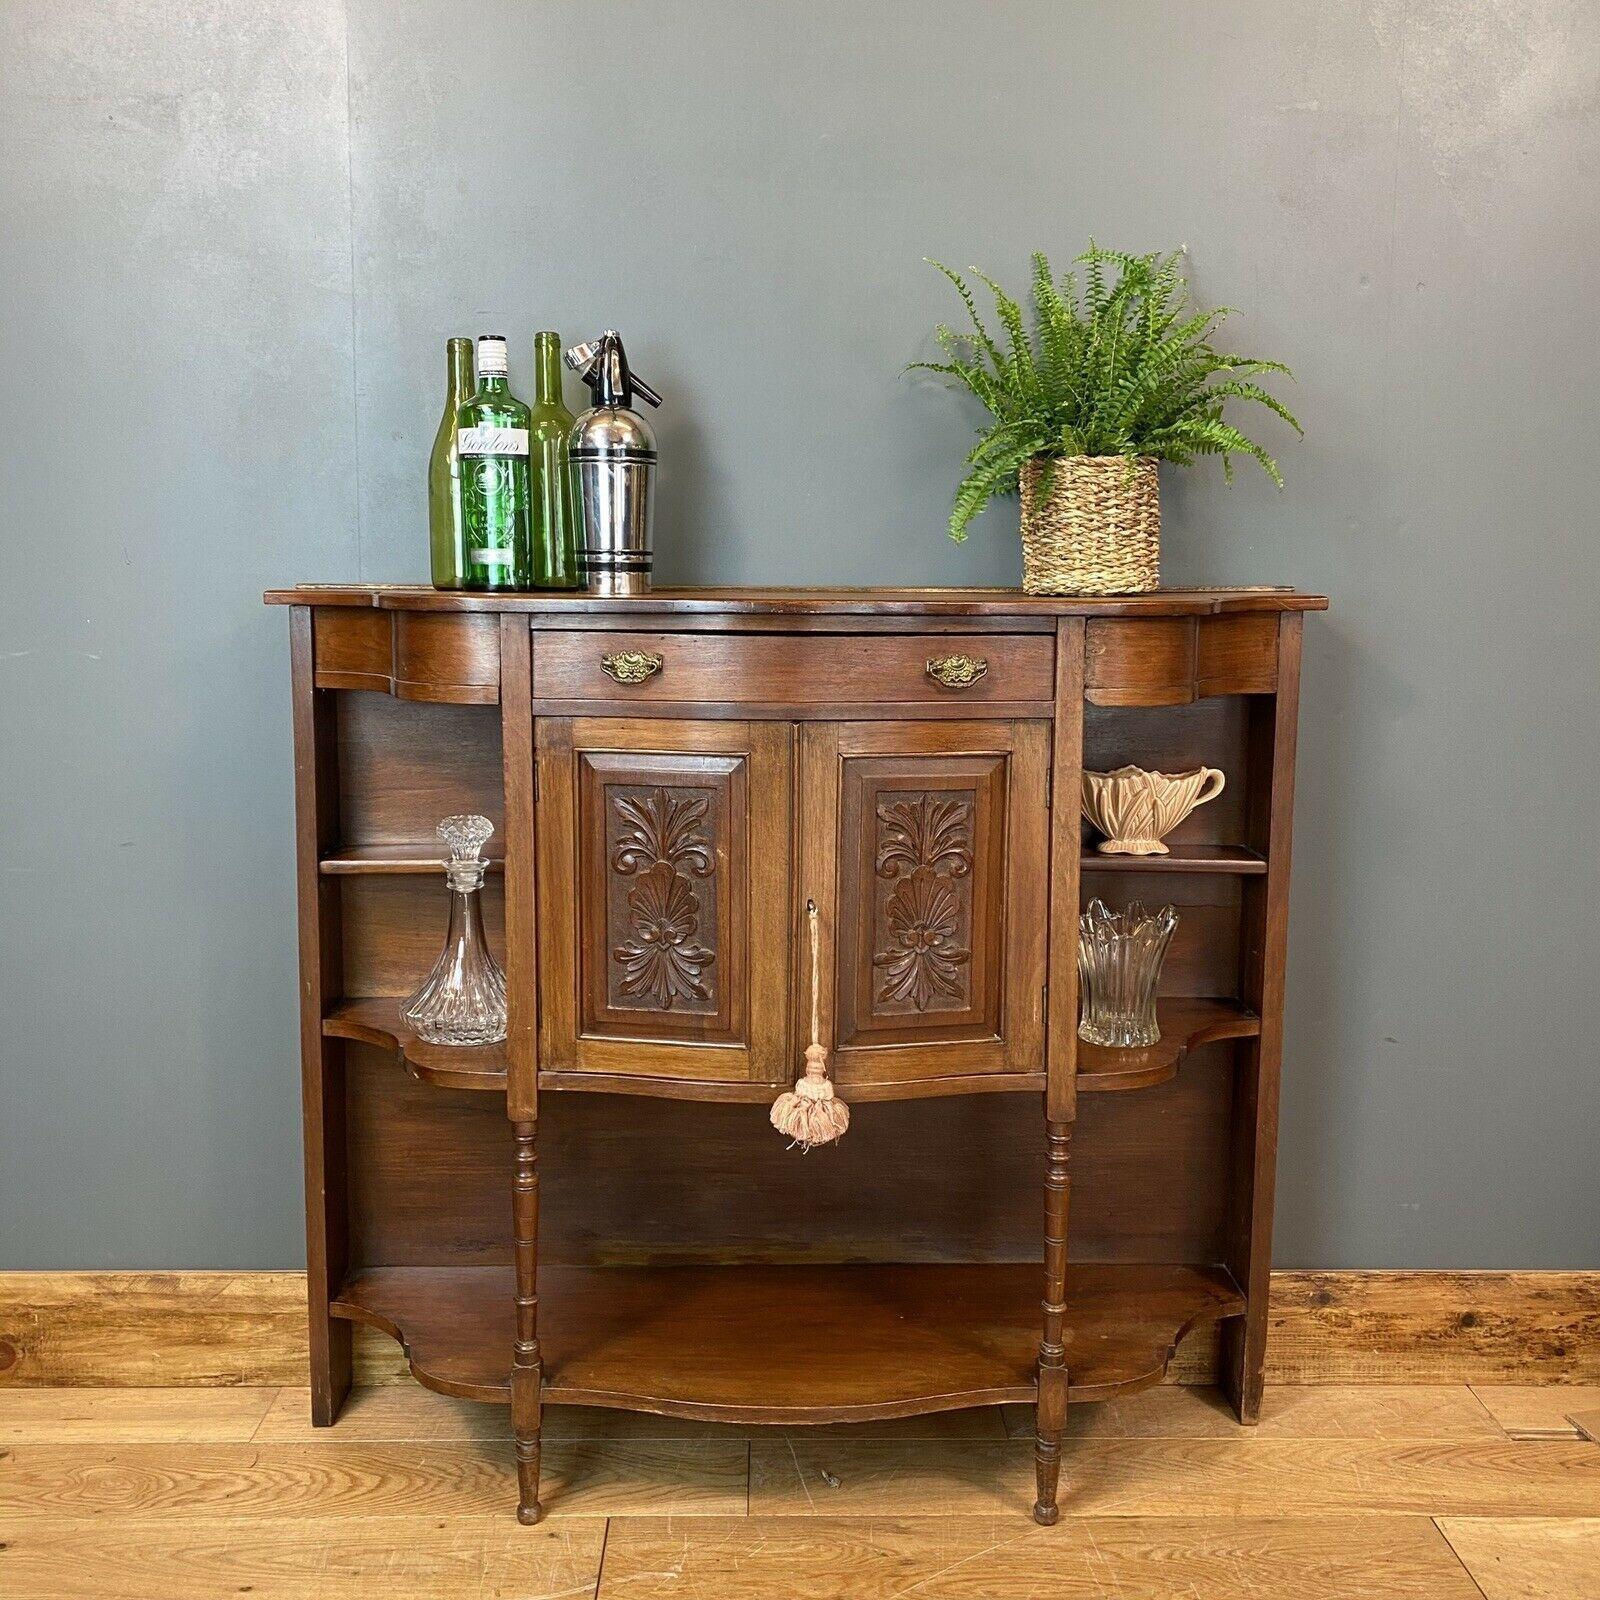 Antique Mahogany Sideboard Edwardian Chiffonier Buffet Server Drinks Cabinet Unknown Vinterior